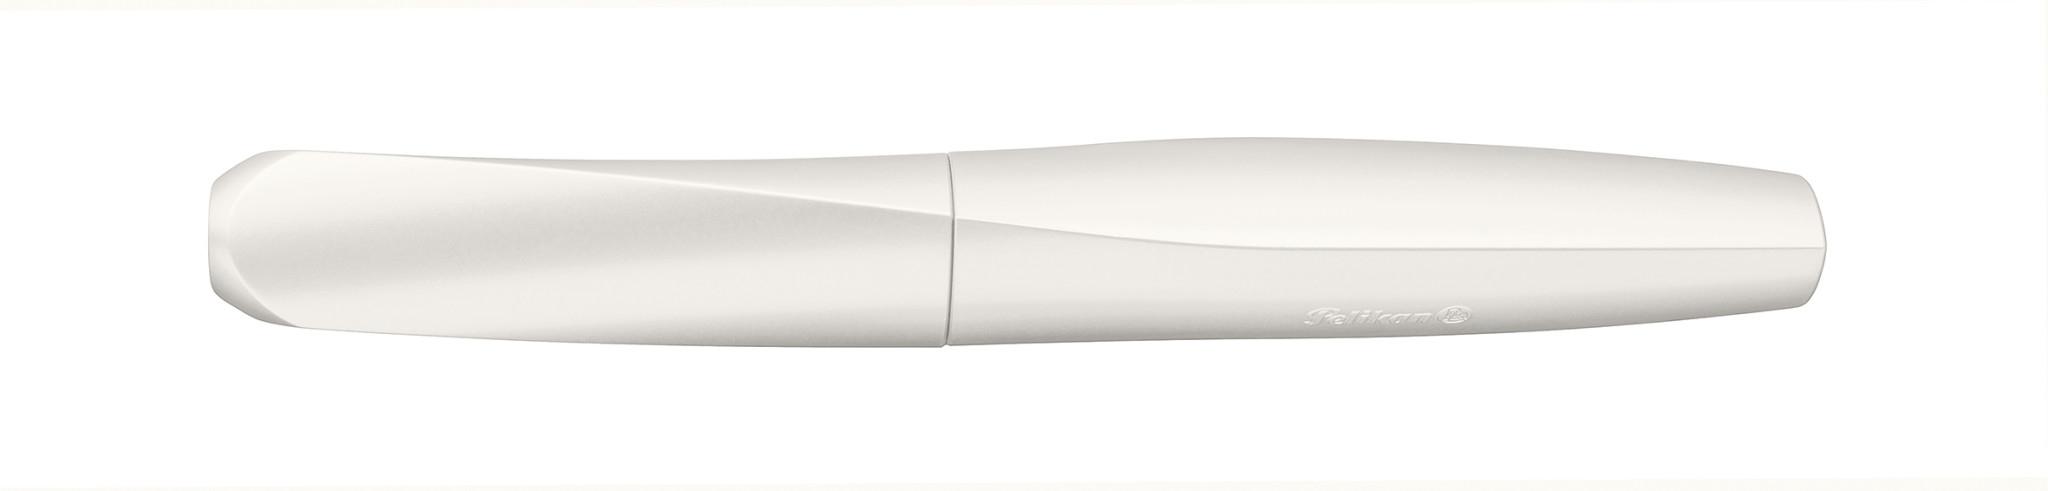 Pelikan 811439 - Twist - Kartuschenfüllsystem - Füller inkl. Tintenpratronen